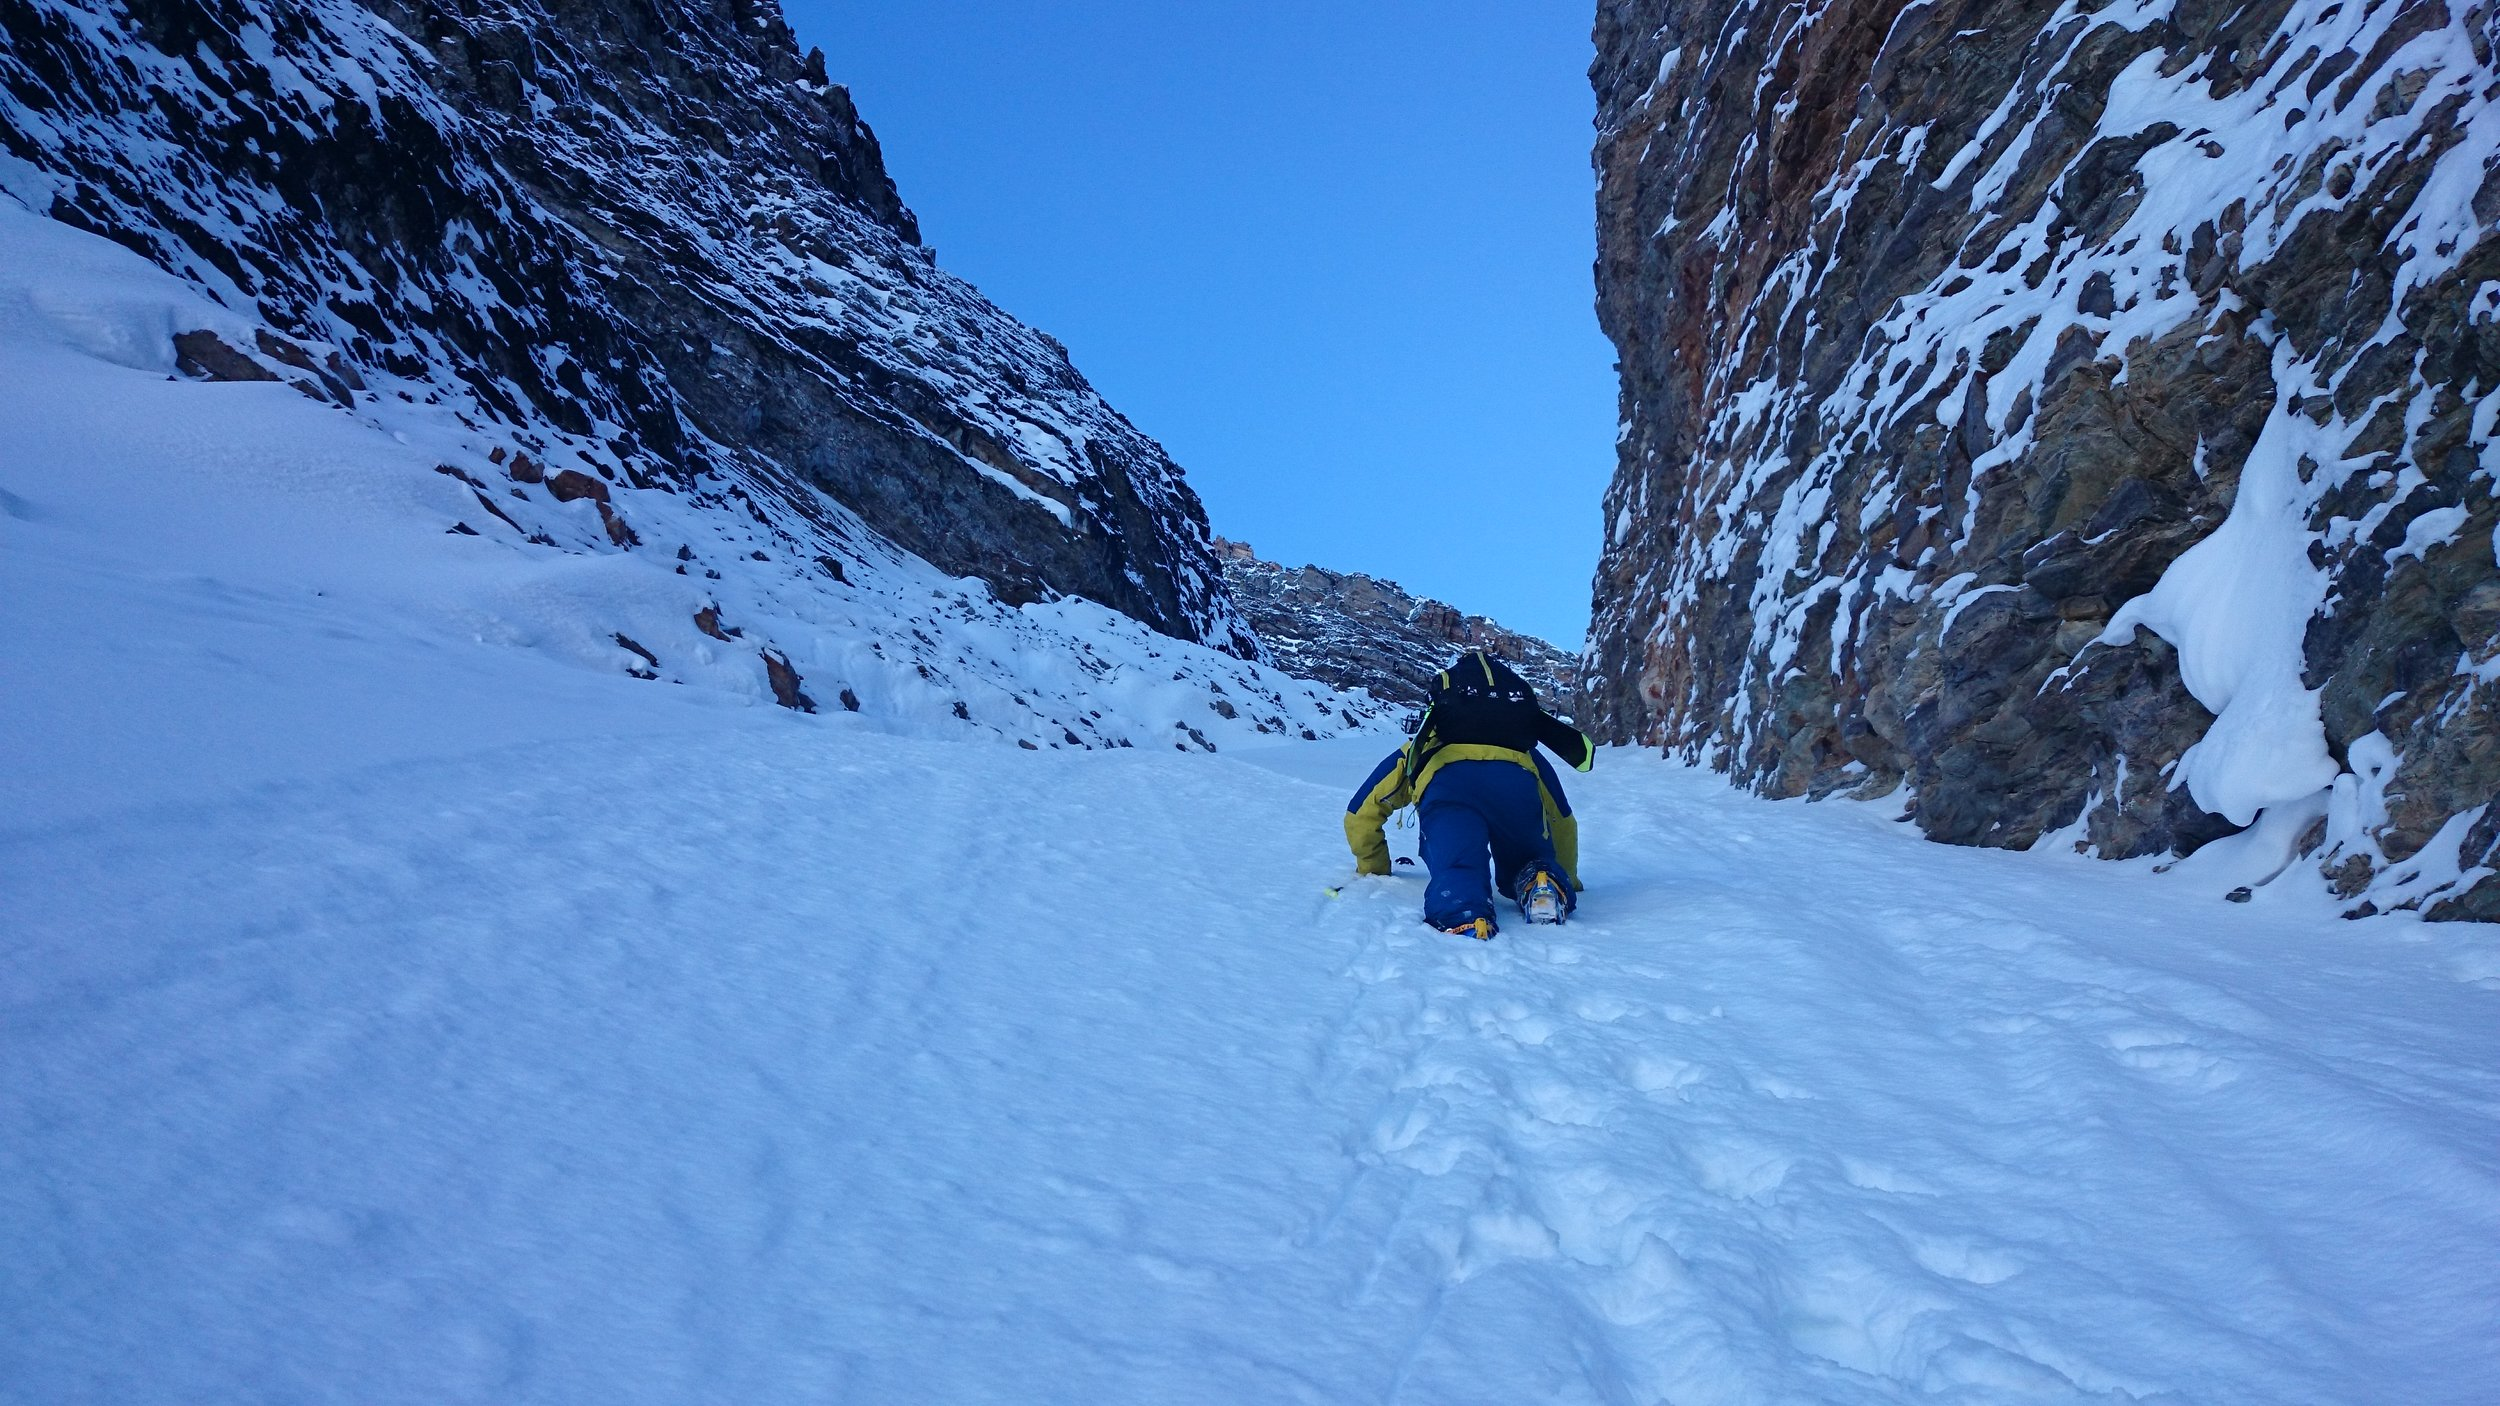 Chris Rubens bootpacking up a chute near Taylor Lake